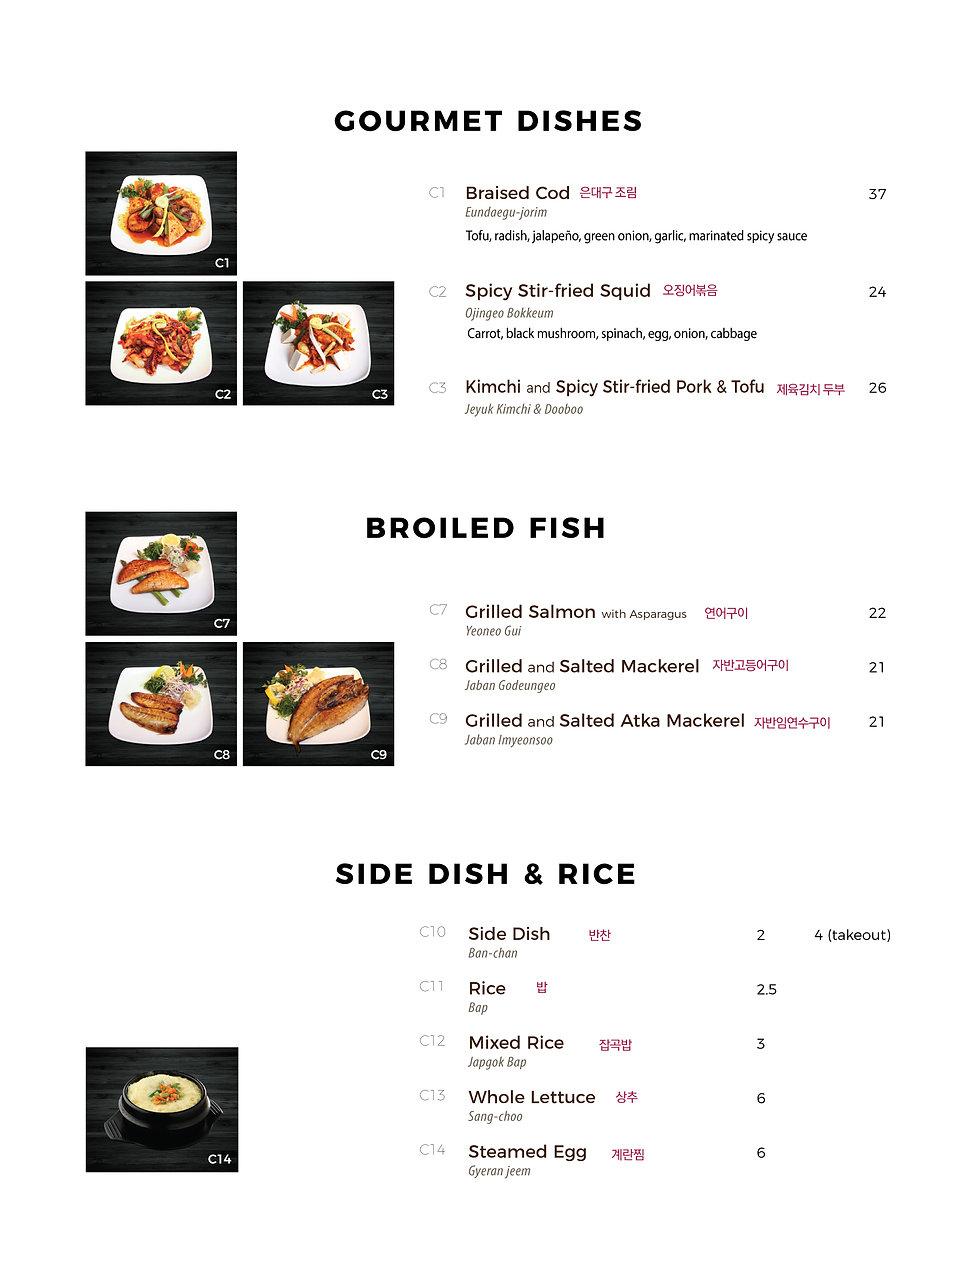 3p_GourmetDish_BroiledFish.jpg